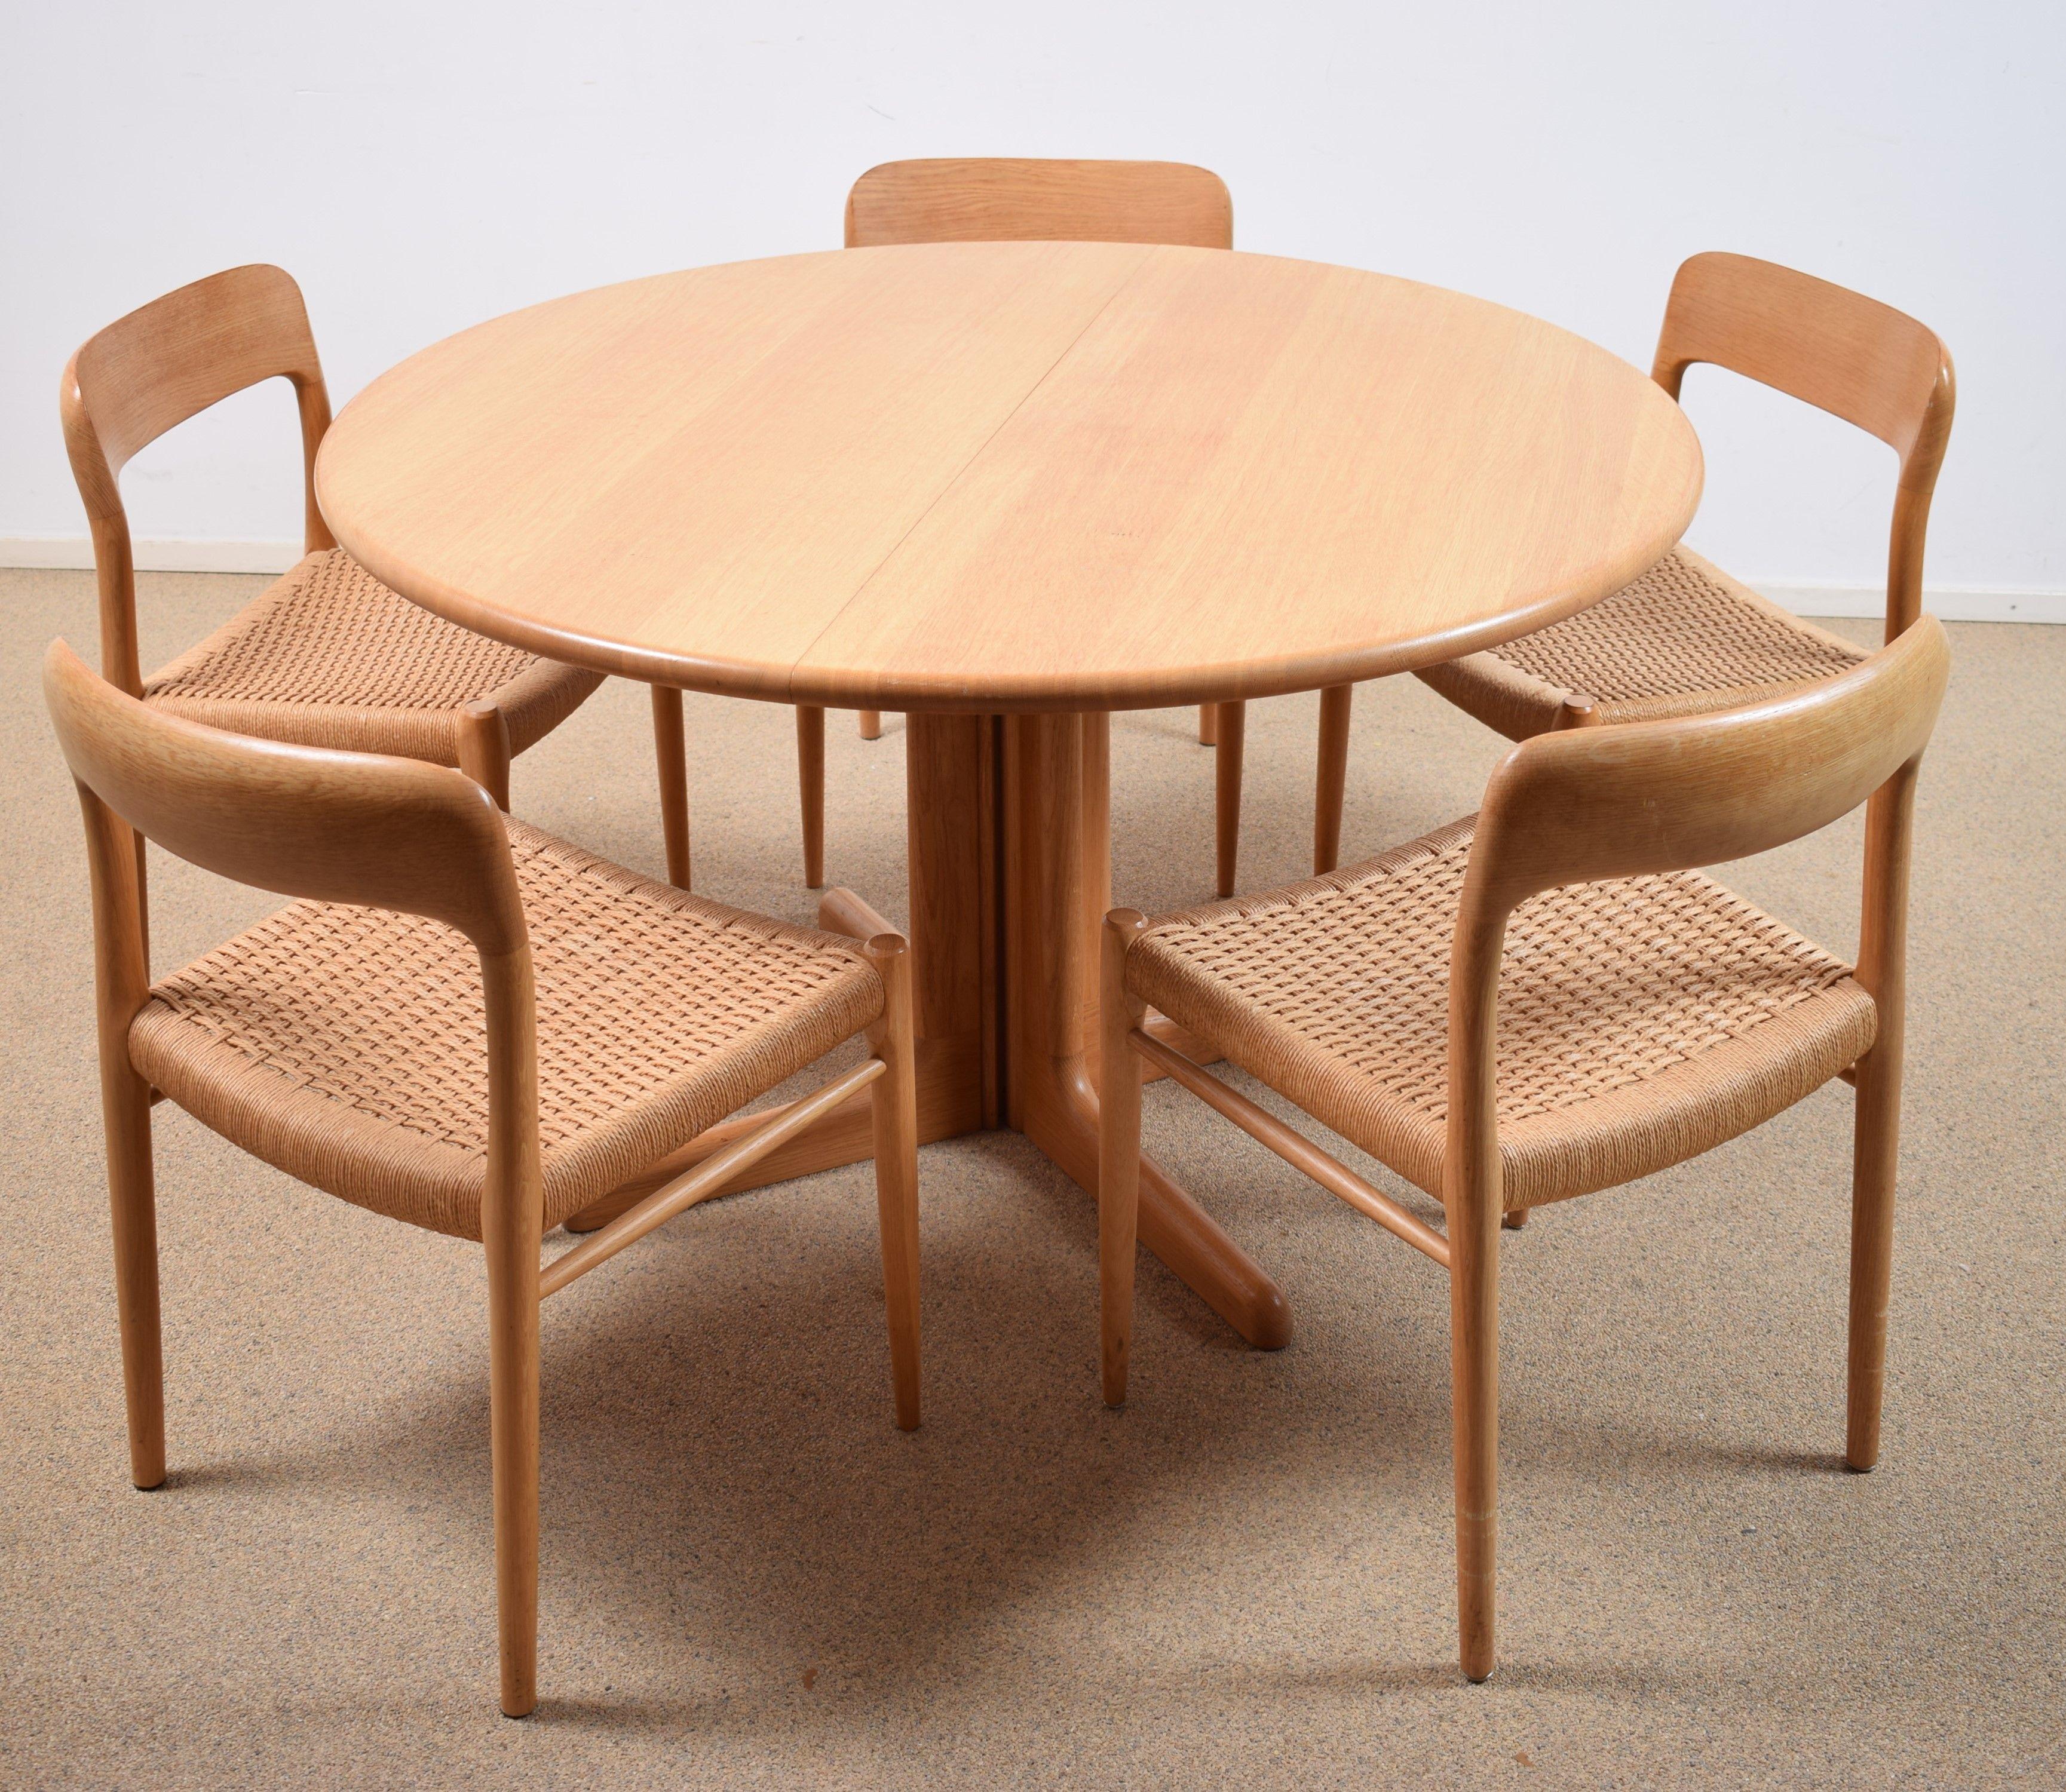 Office Cabin Interior Design, Vintage Dining Table Set By Niels Otto Moller 1950s Design Market